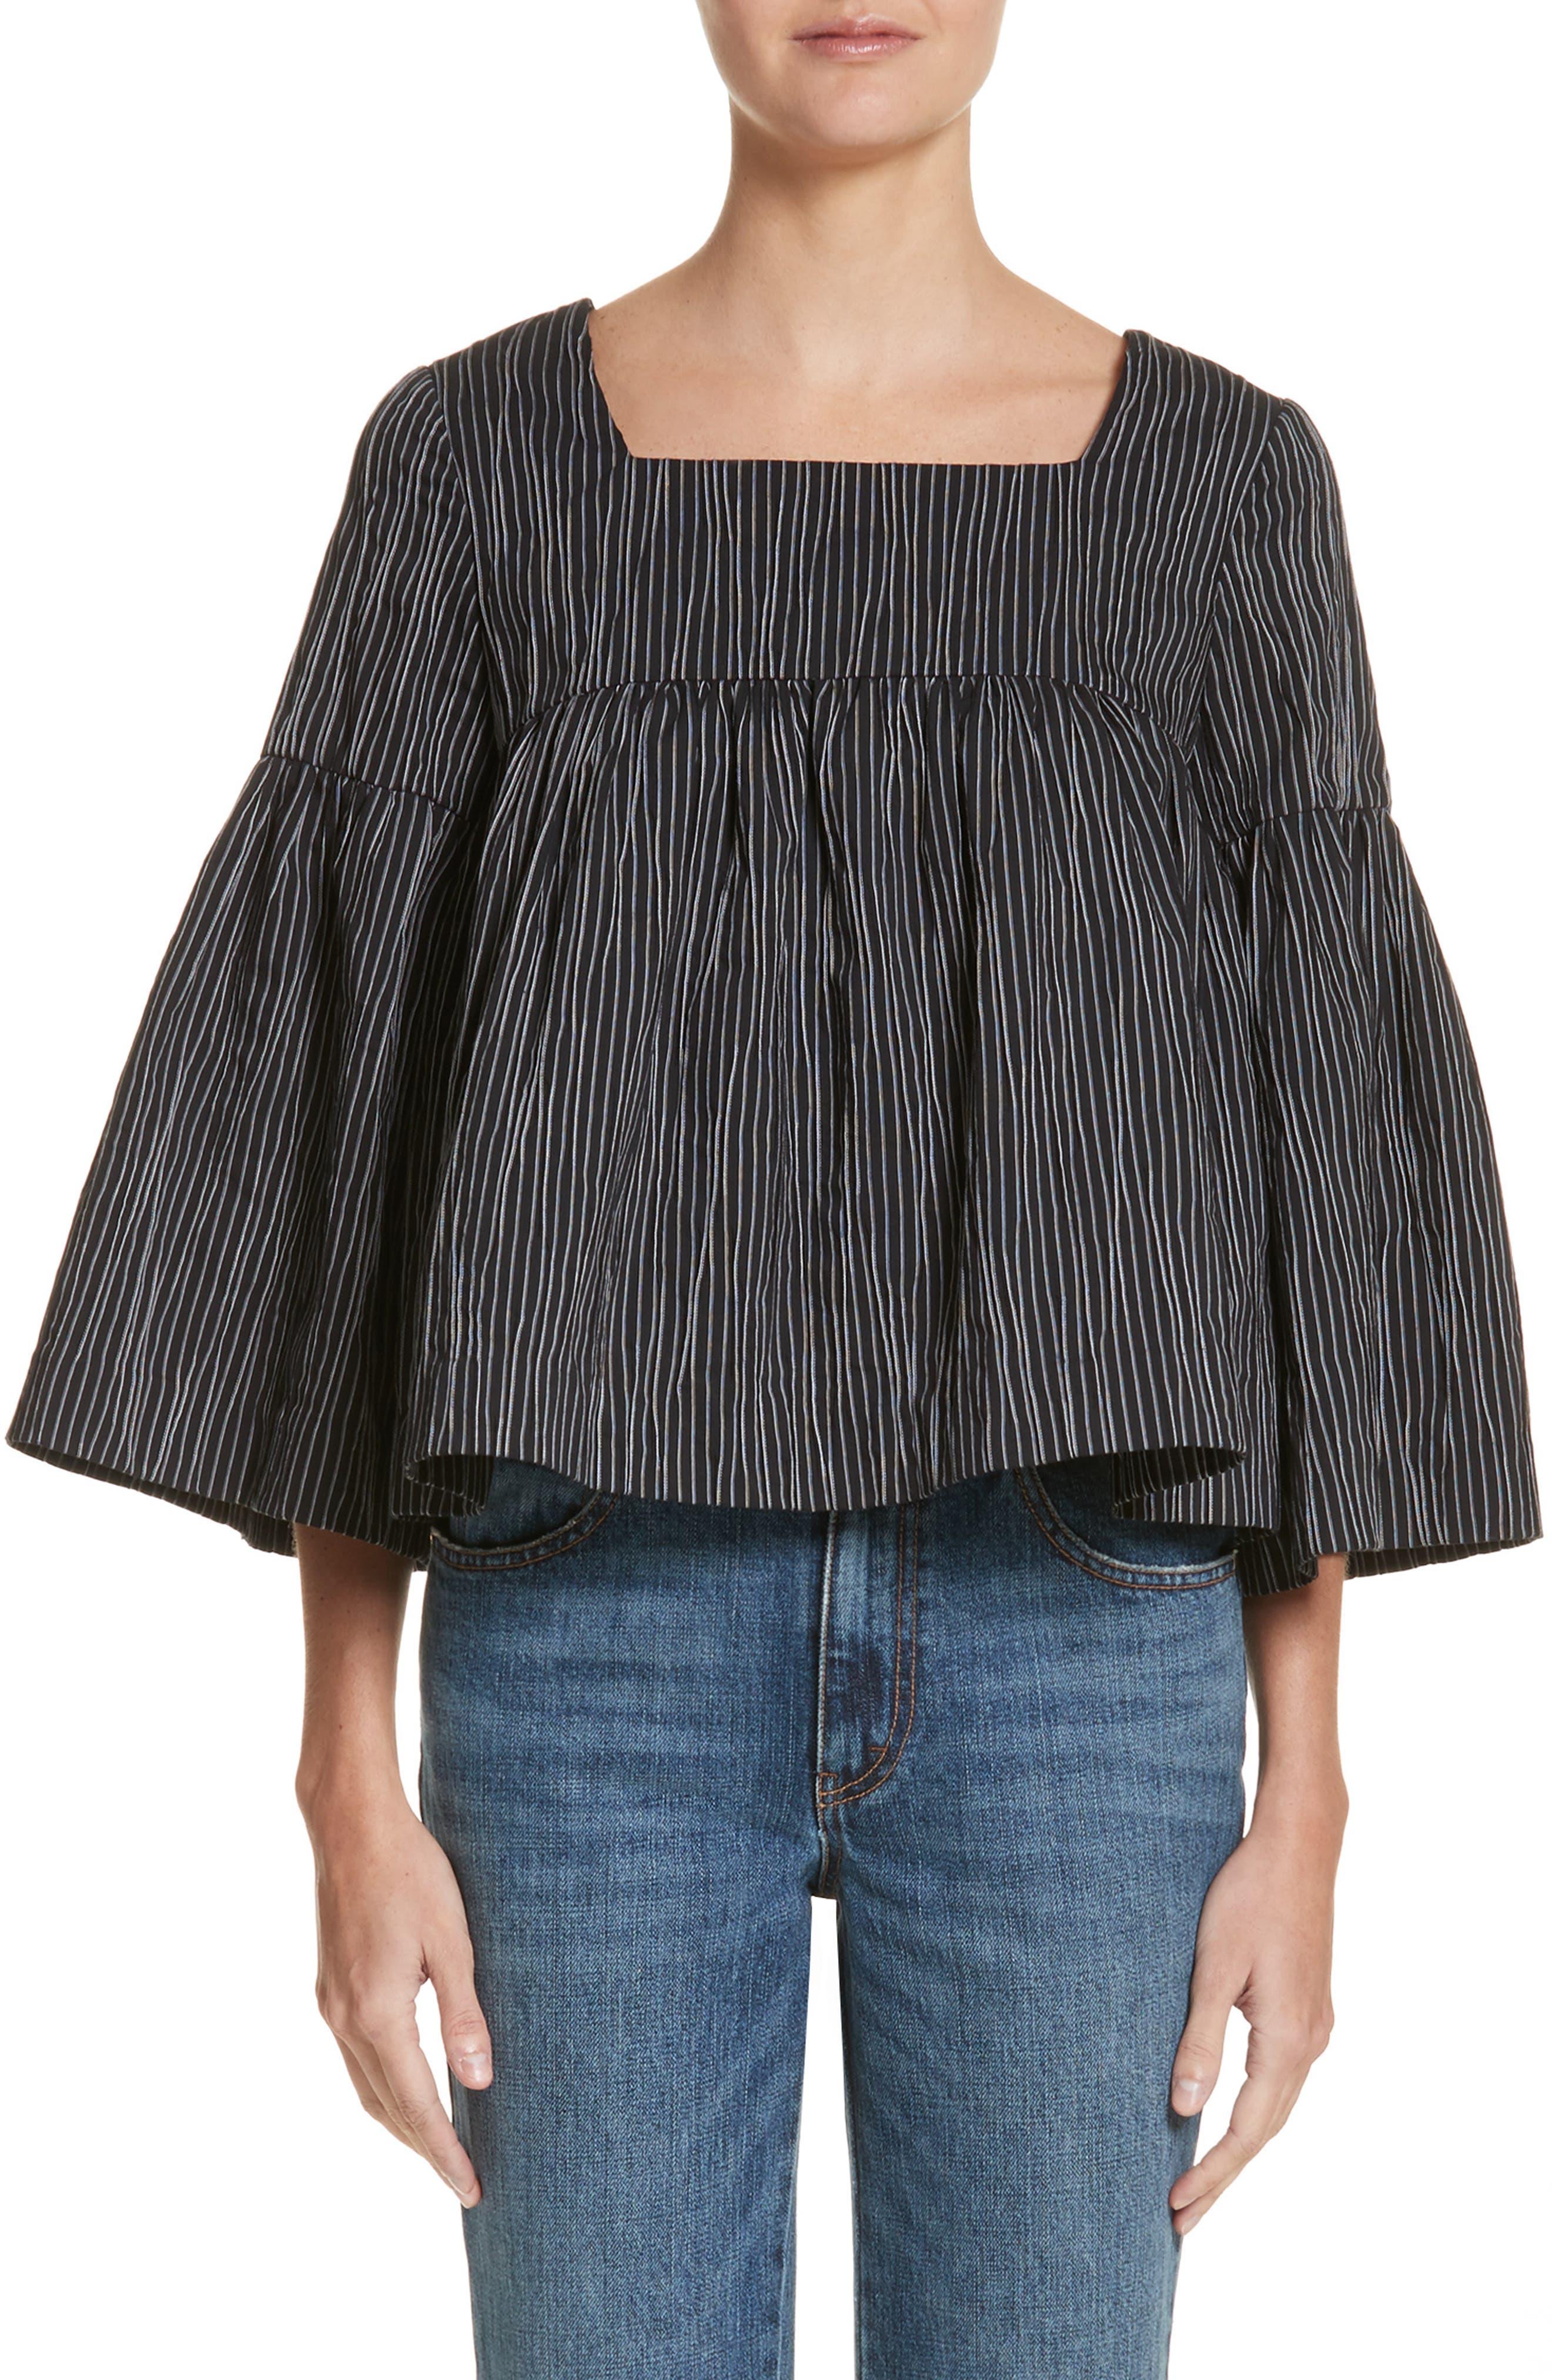 Stripe Crinkle Cotton Blend Swing Top,                             Main thumbnail 1, color,                             Black/ White Stripe